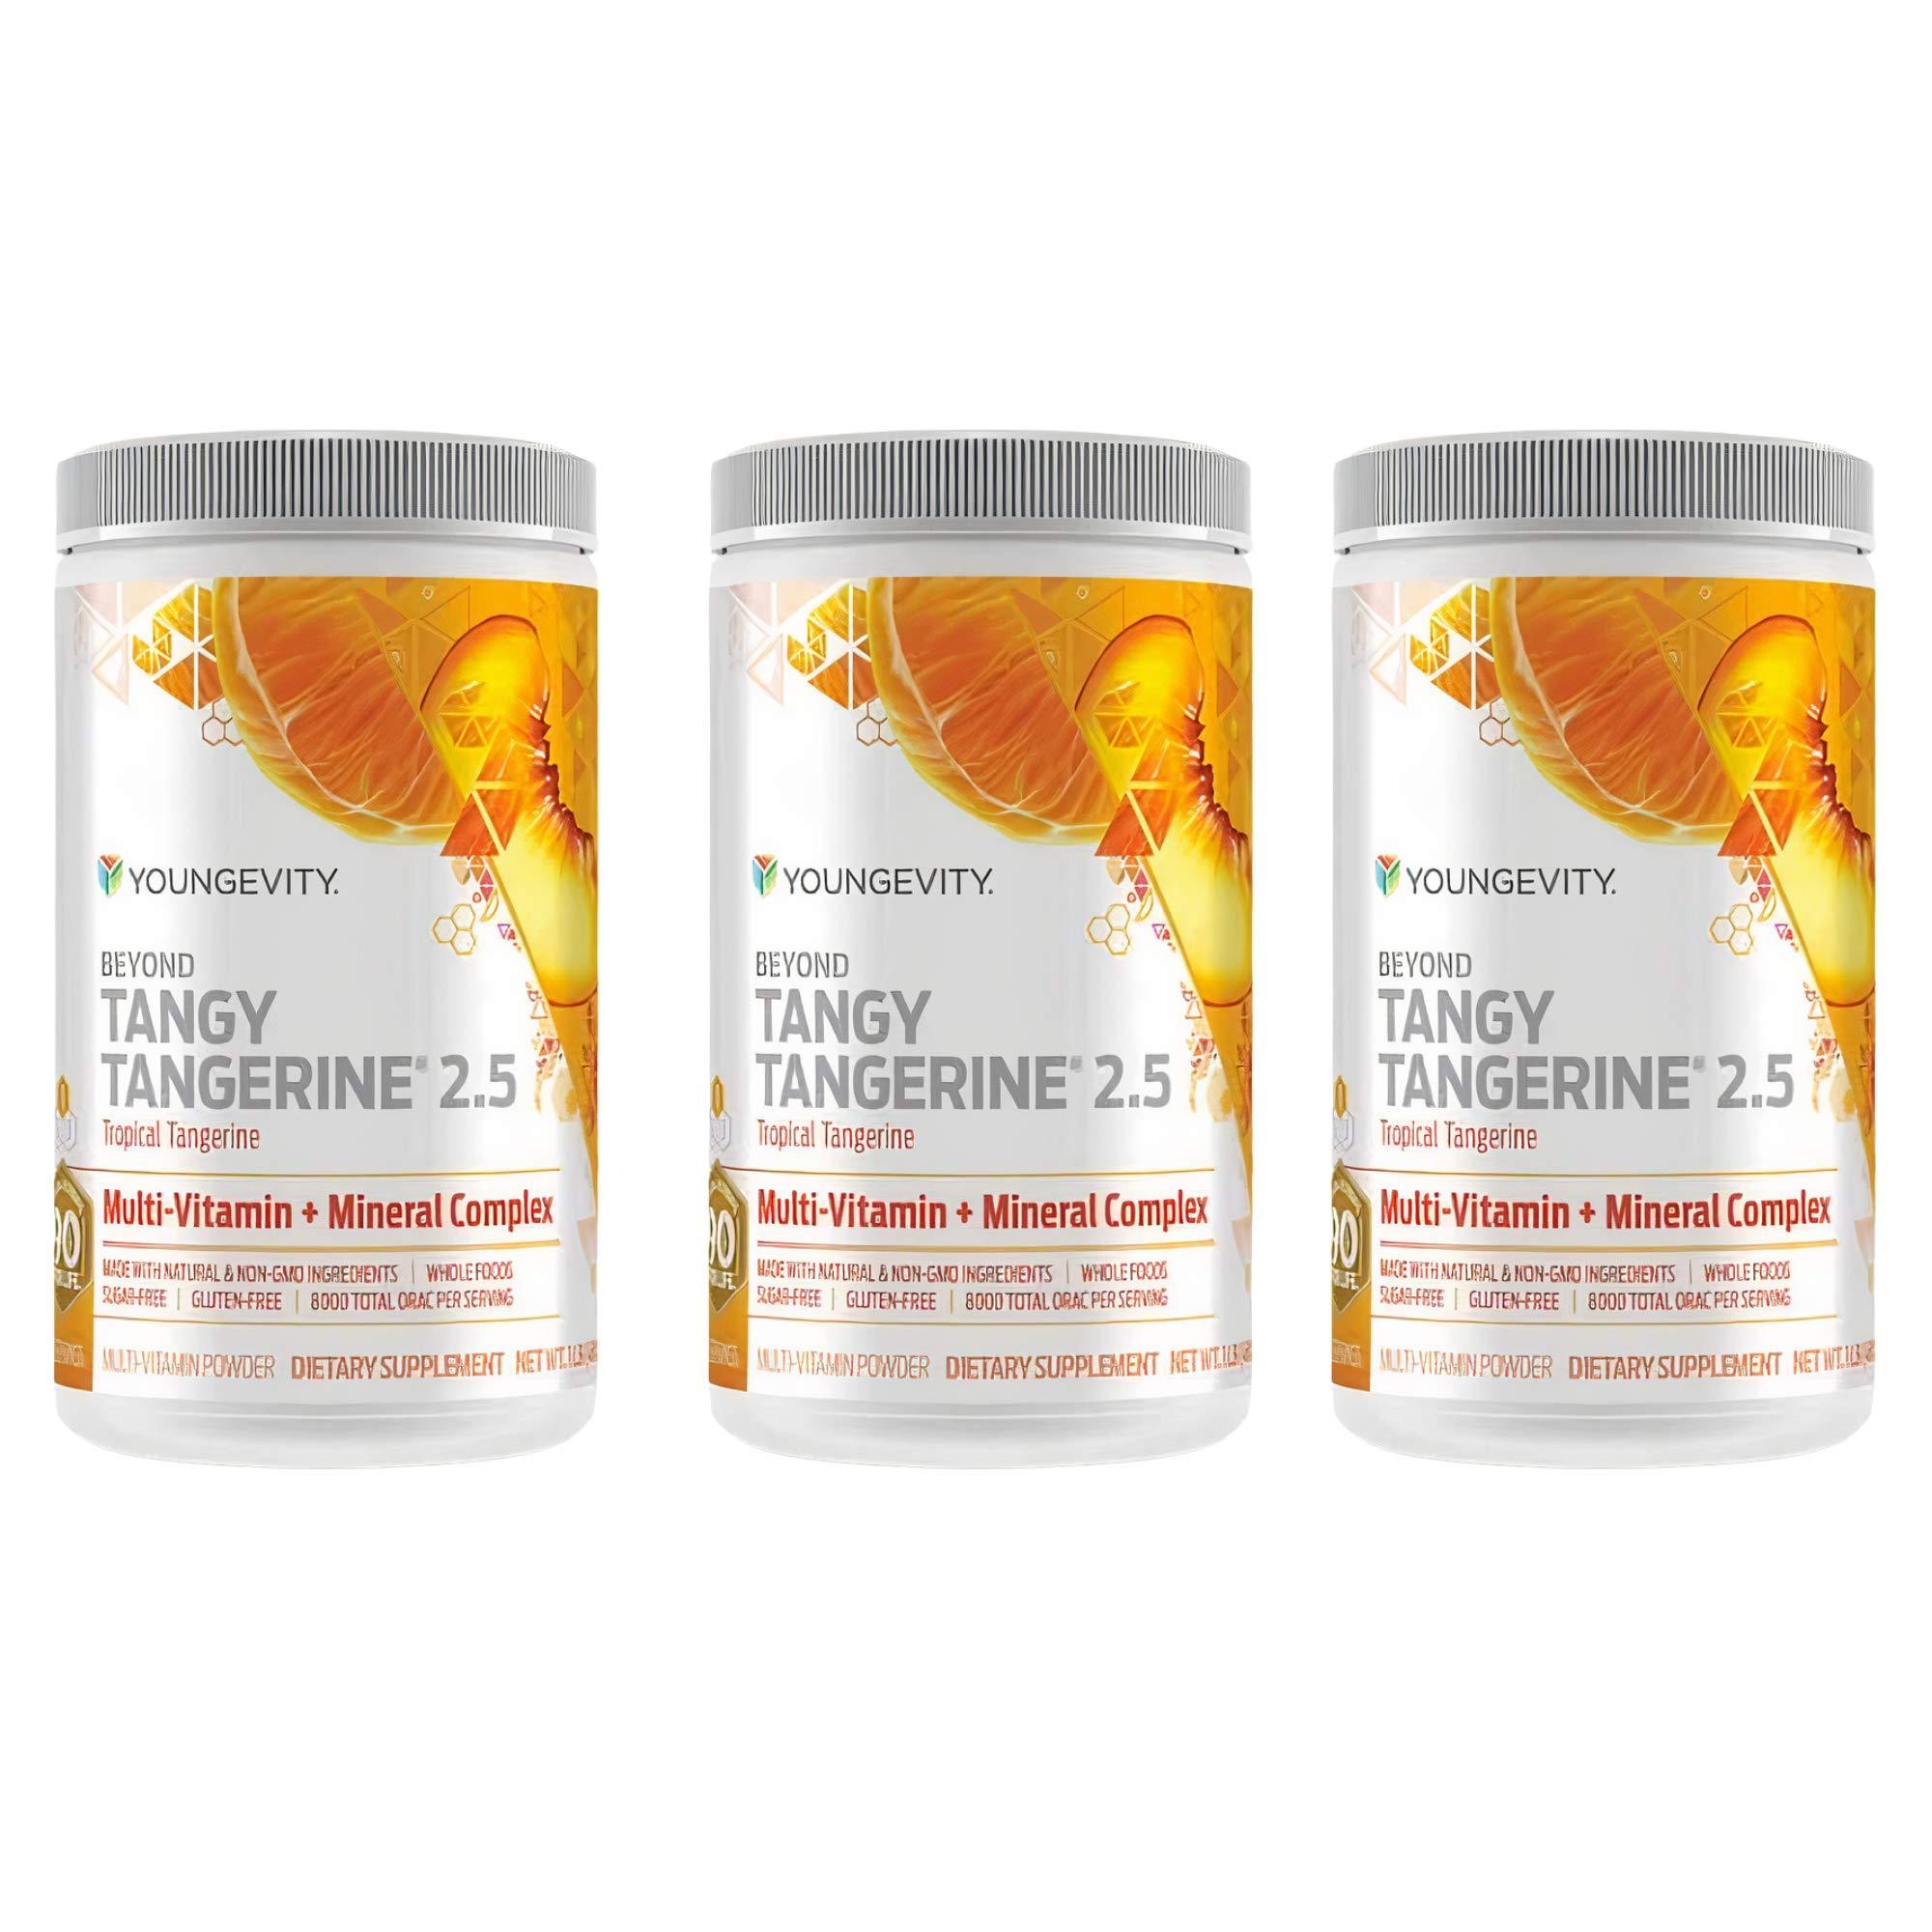 Youngevity Beyond Tangy Tangerine 2.5 Citrus Peach Fusion Multi-Vitamin (New) (3)